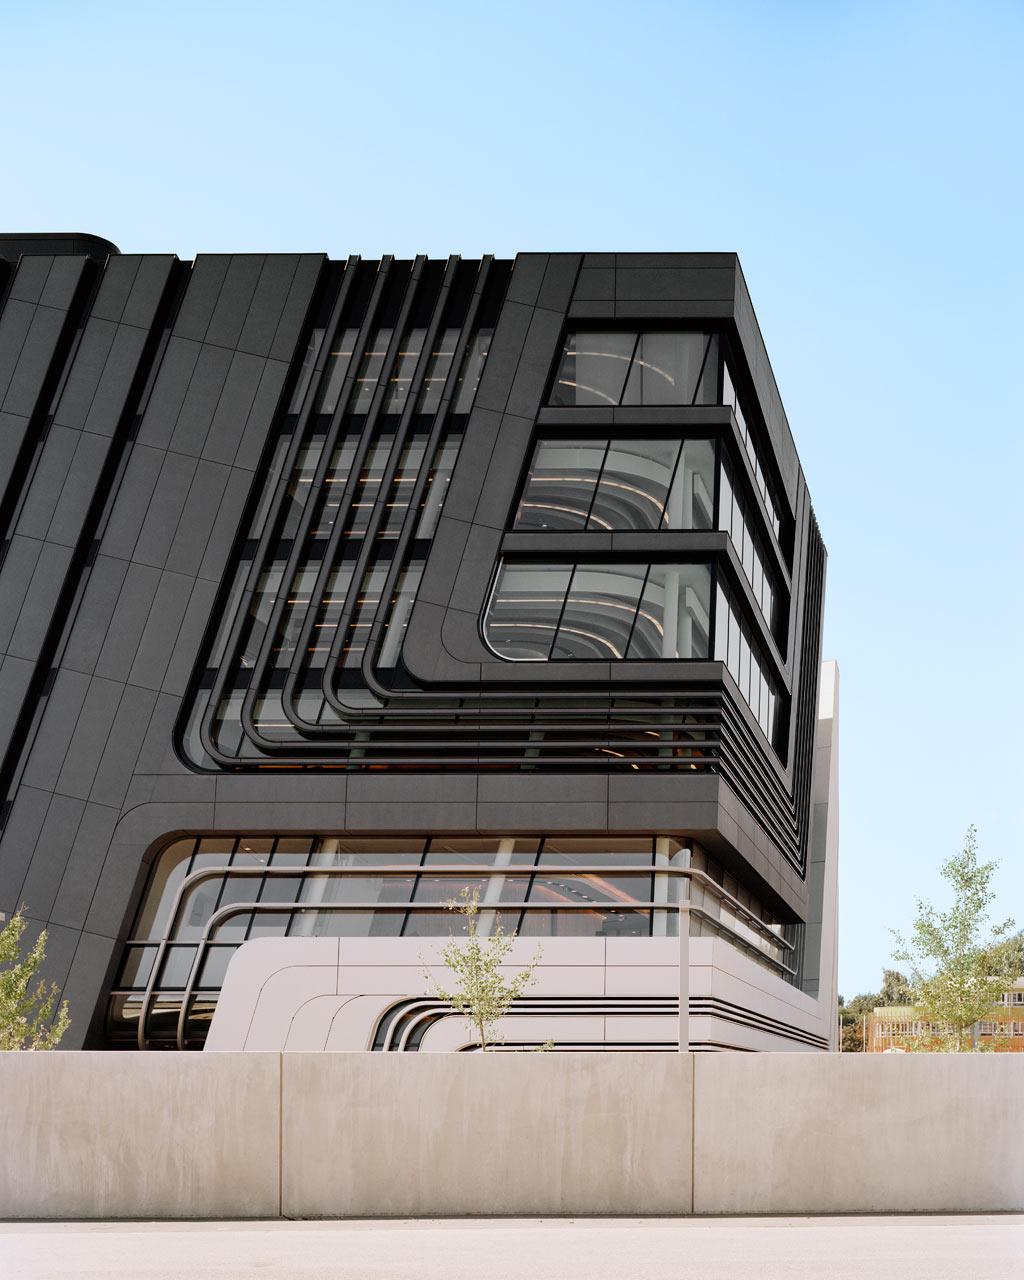 Futuristic Architecture: Learning Center by Zaha Hadid